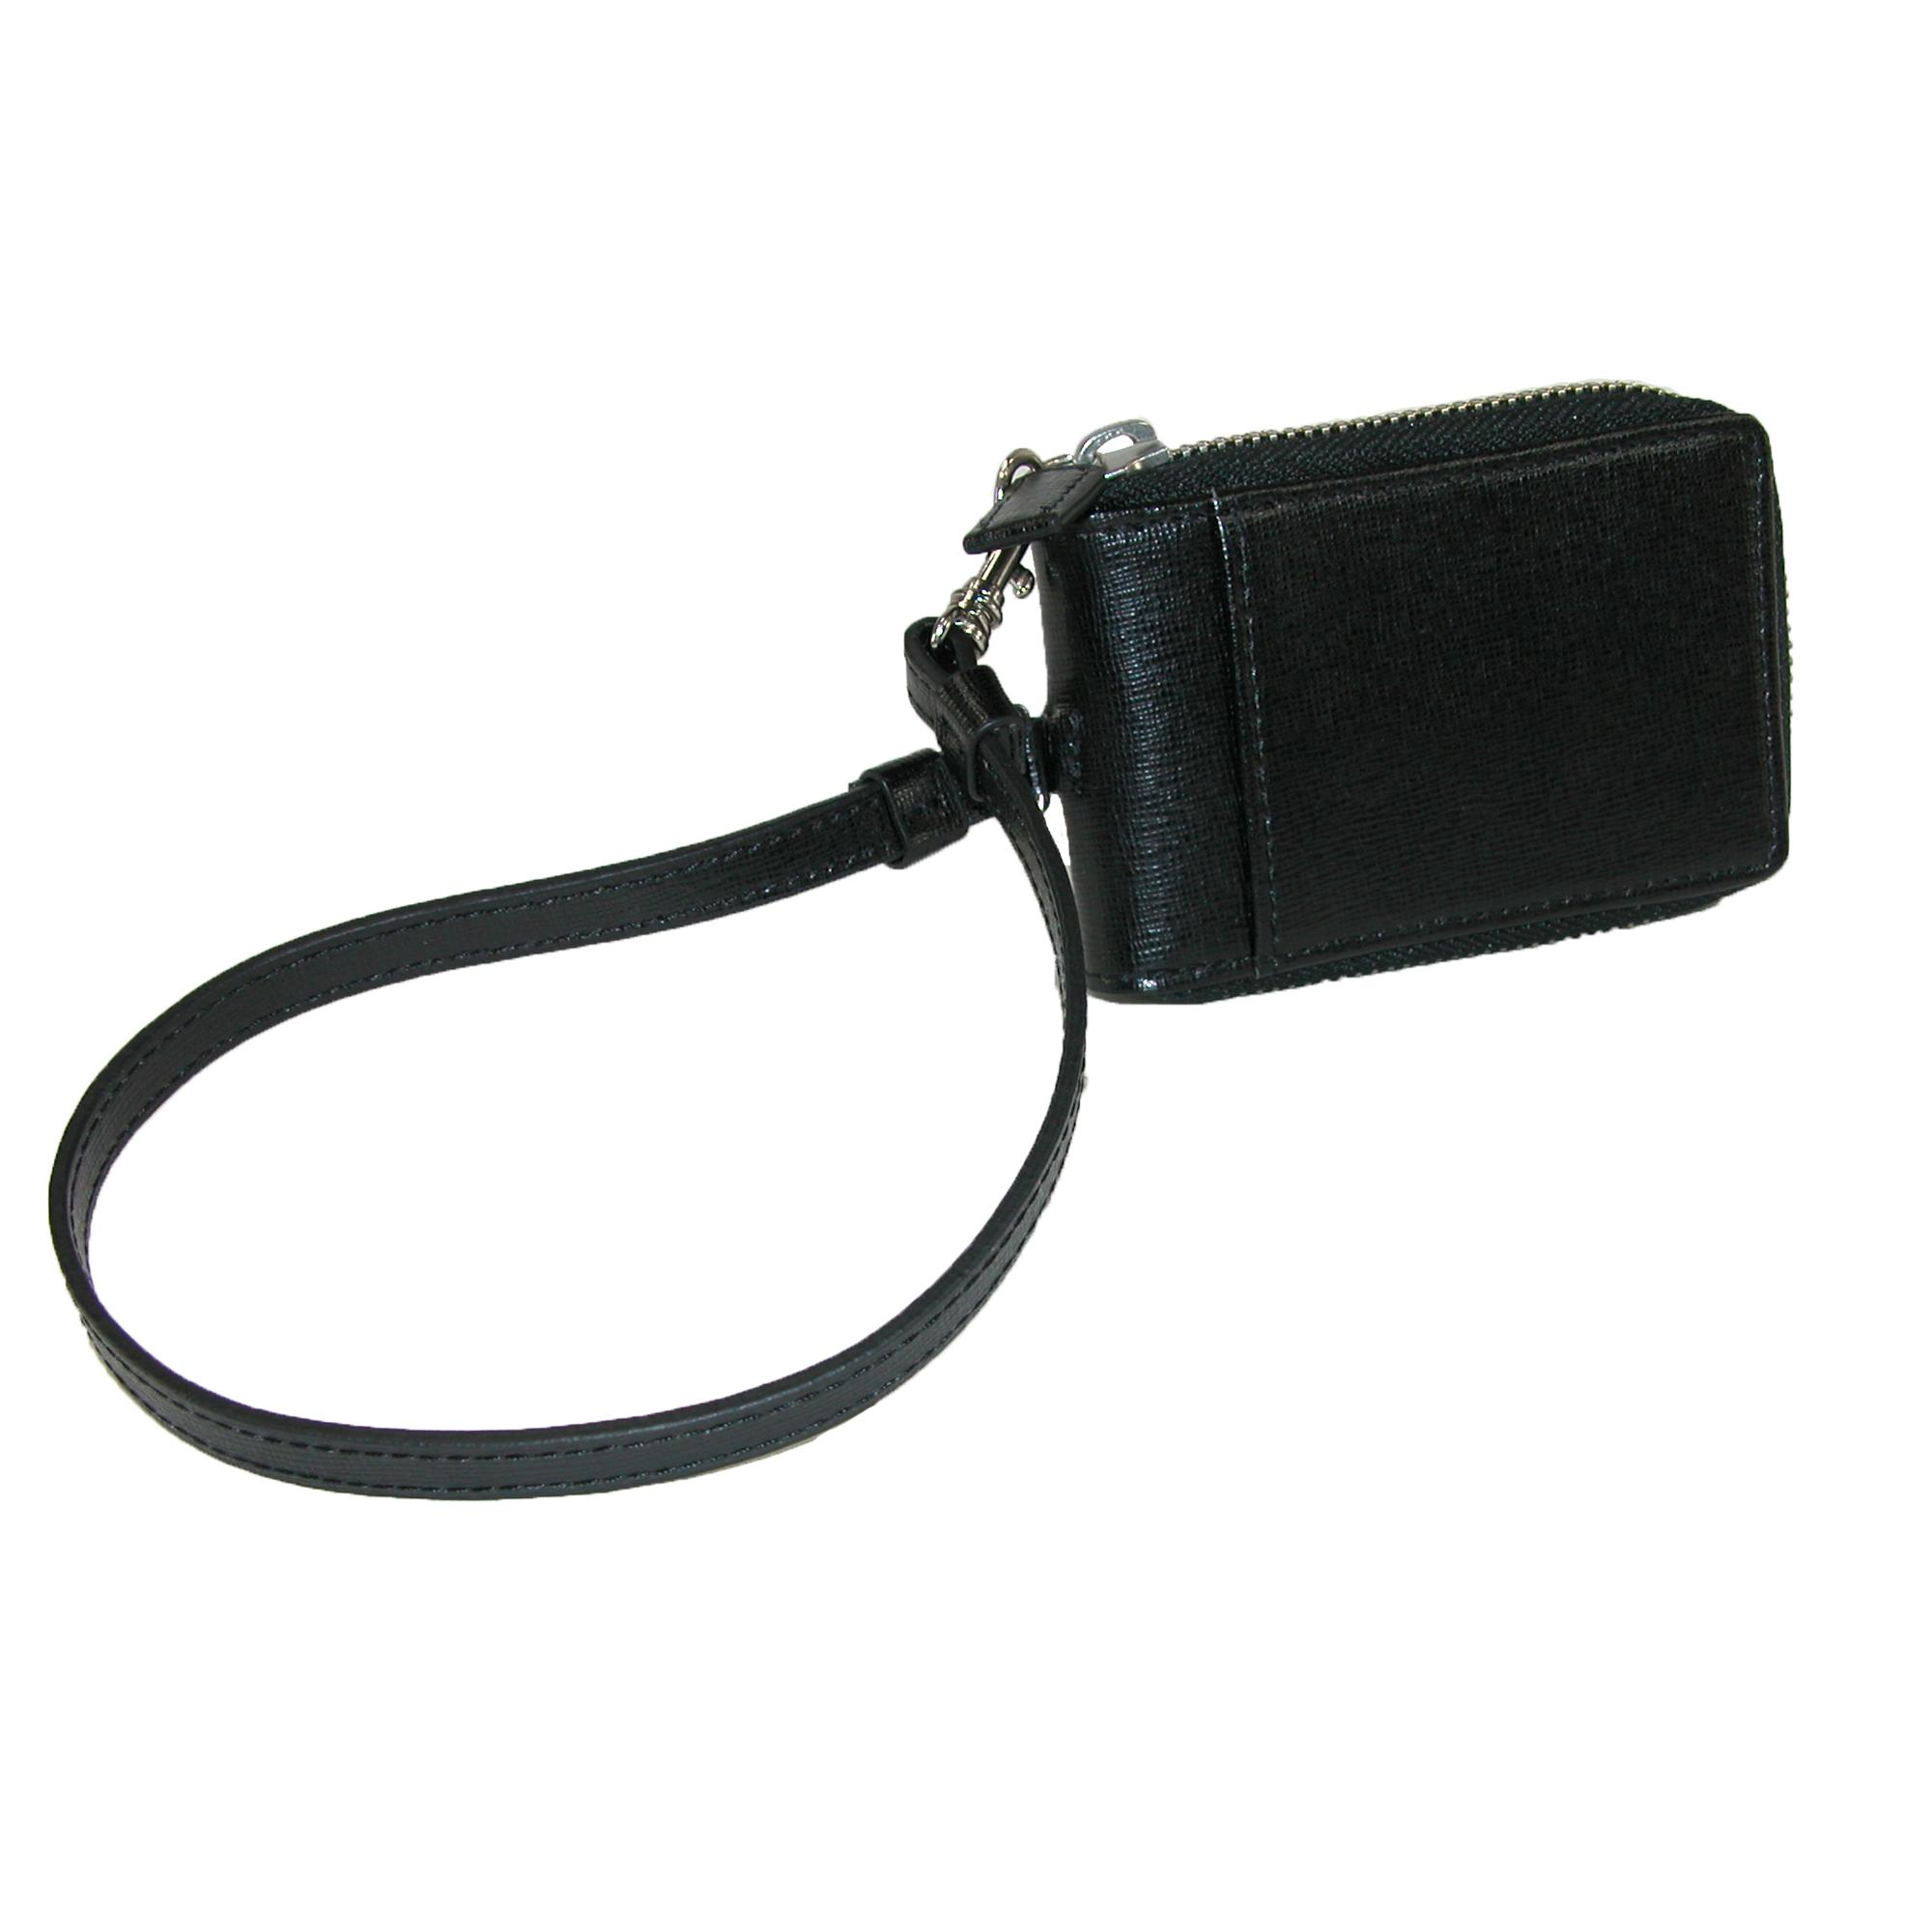 Royce Leather Leather Rfid Blocking Zip Around Key Case With Wrist Strap